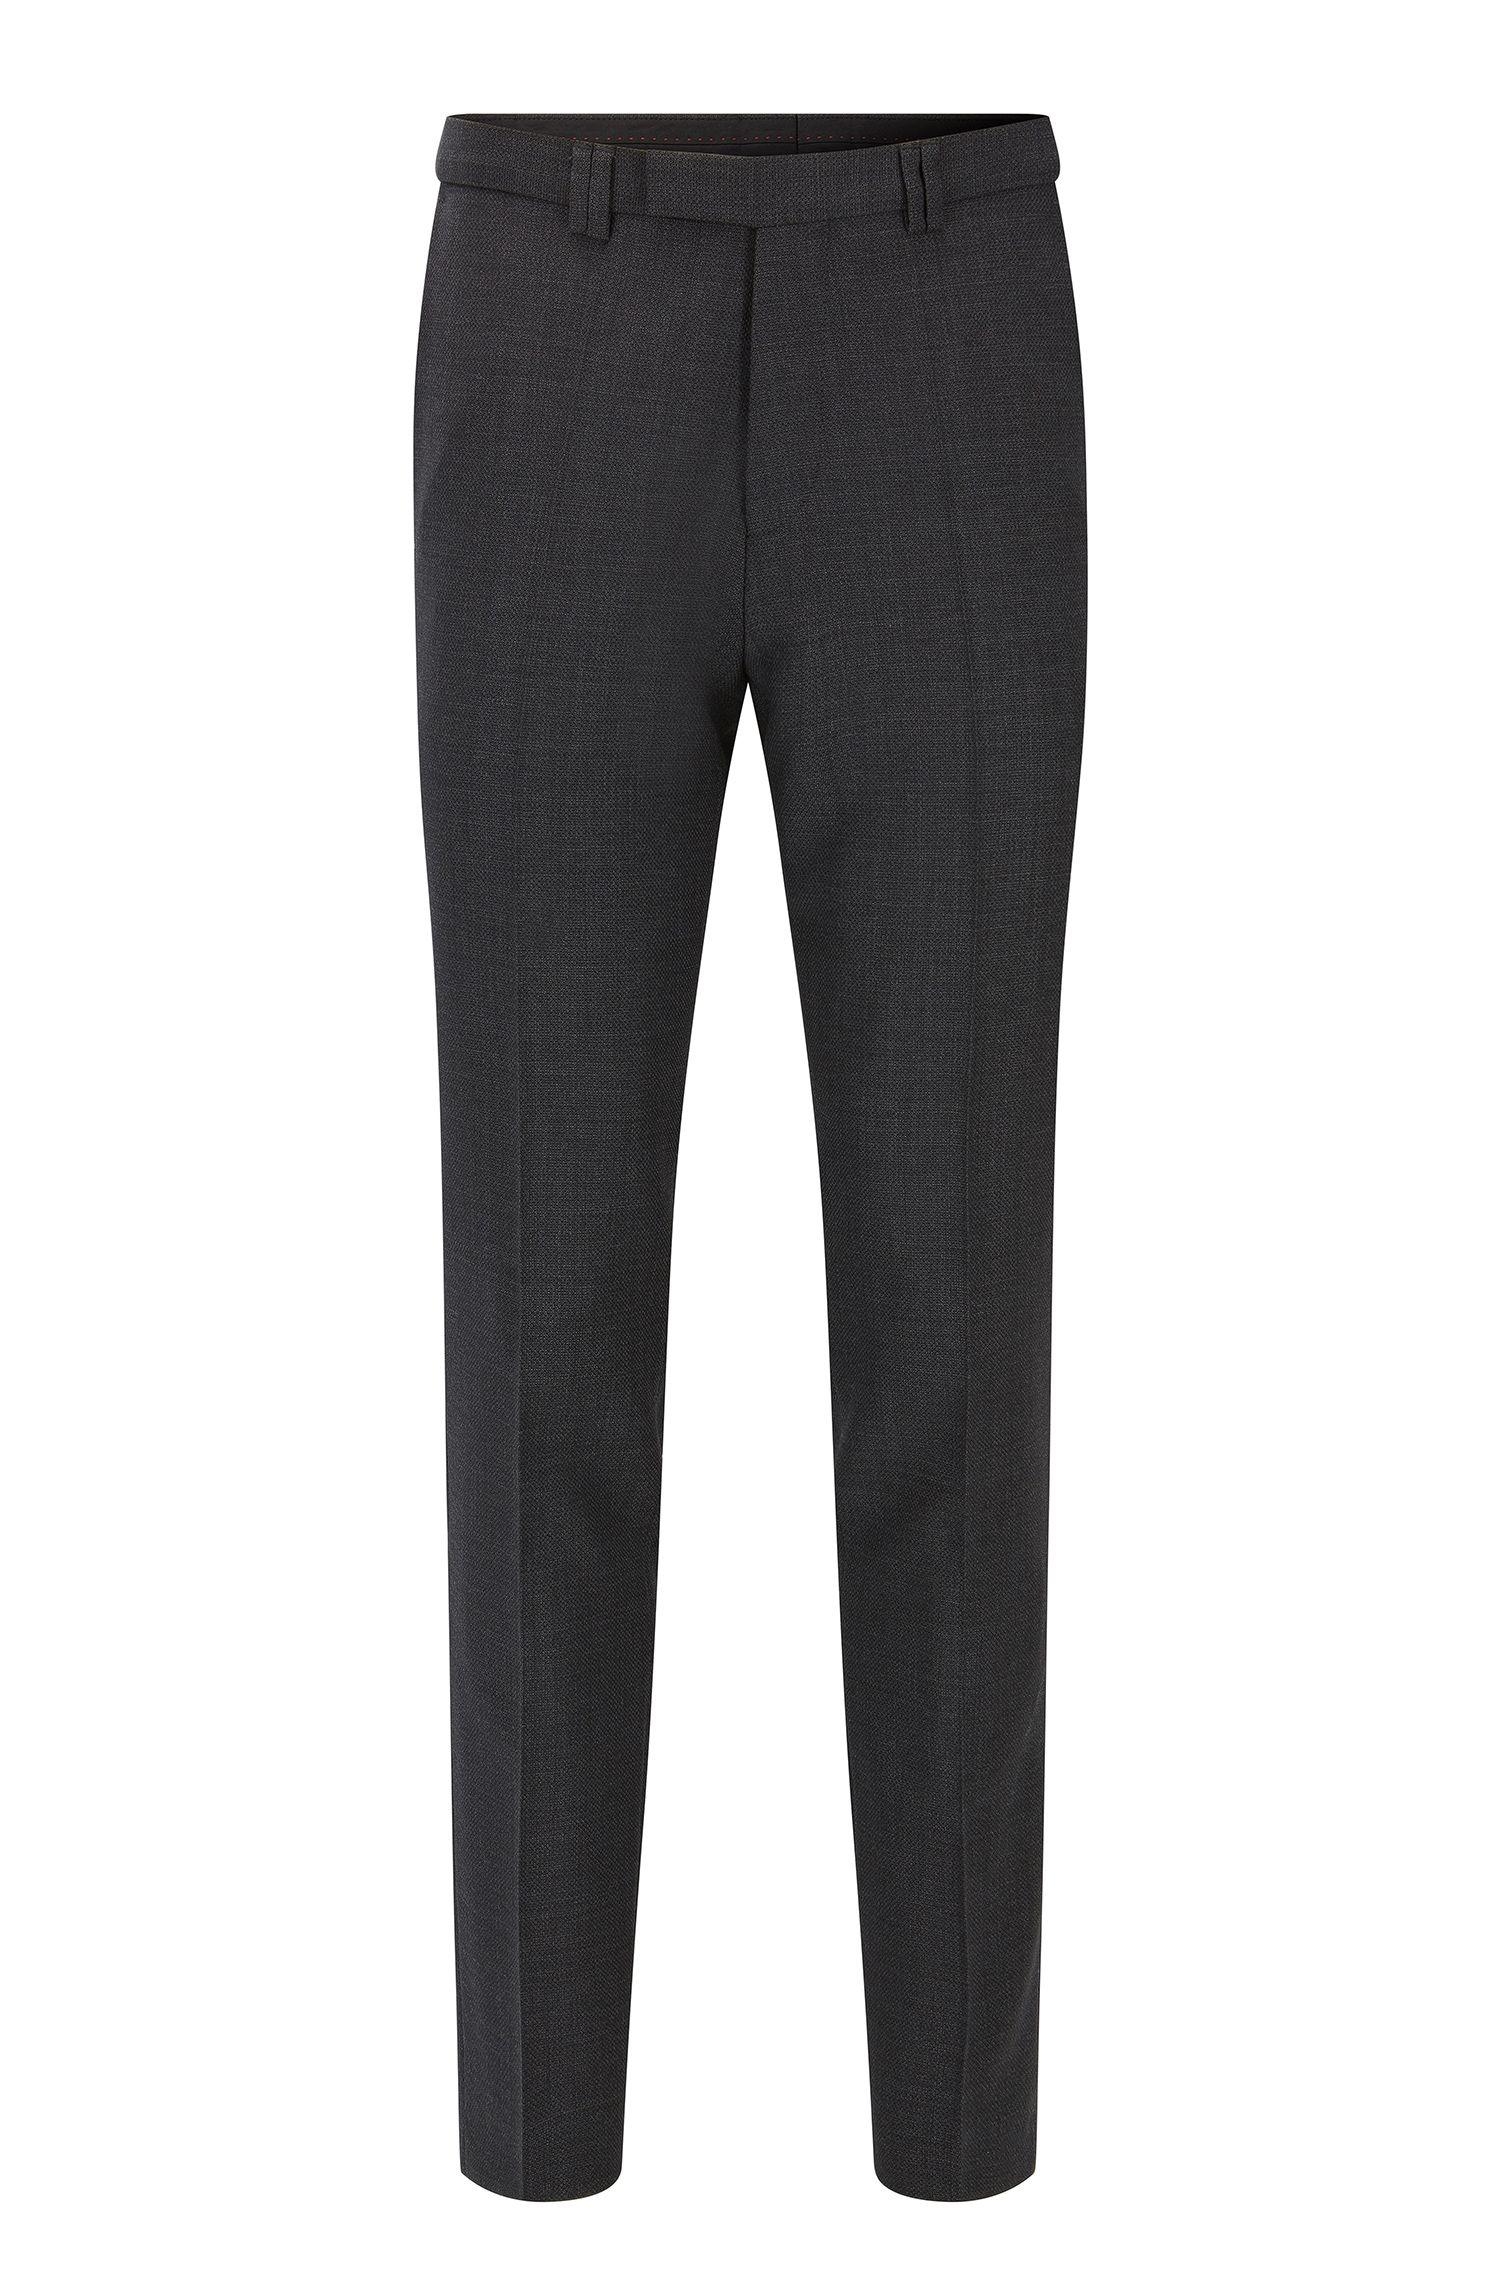 Pantaloni extra slim fit in lana vergine con microdisegni